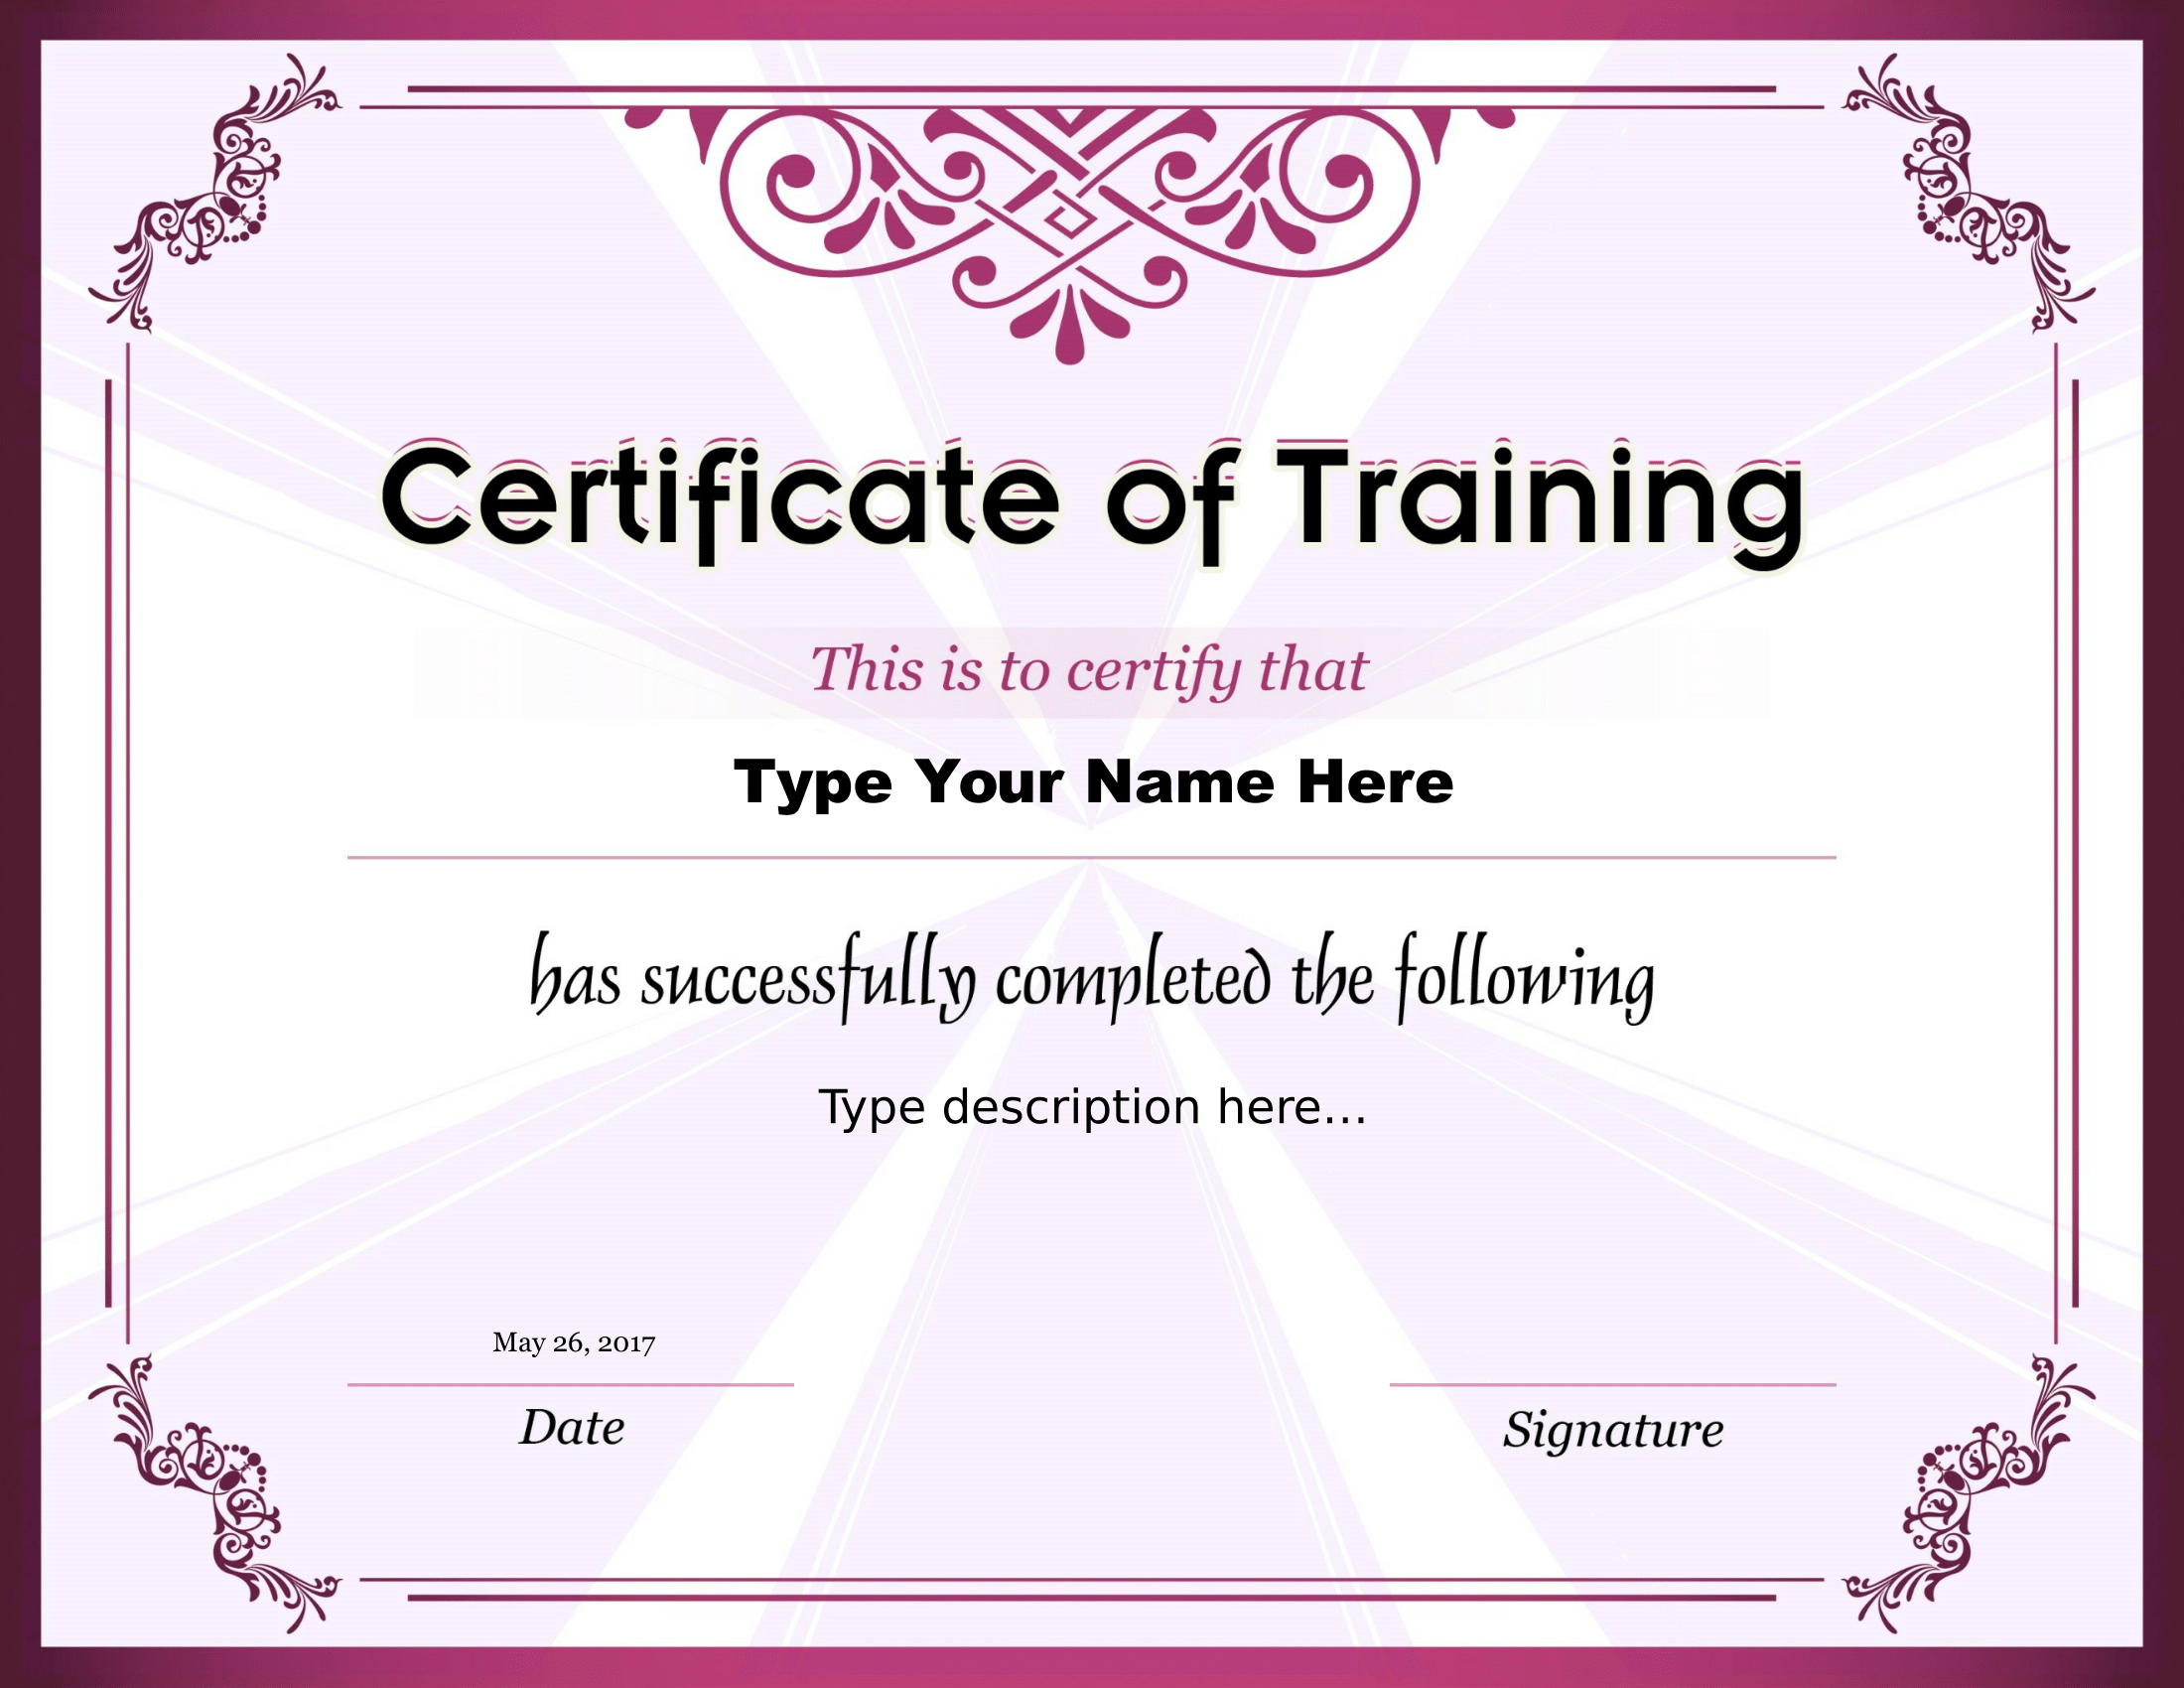 Certificate of Training Sample